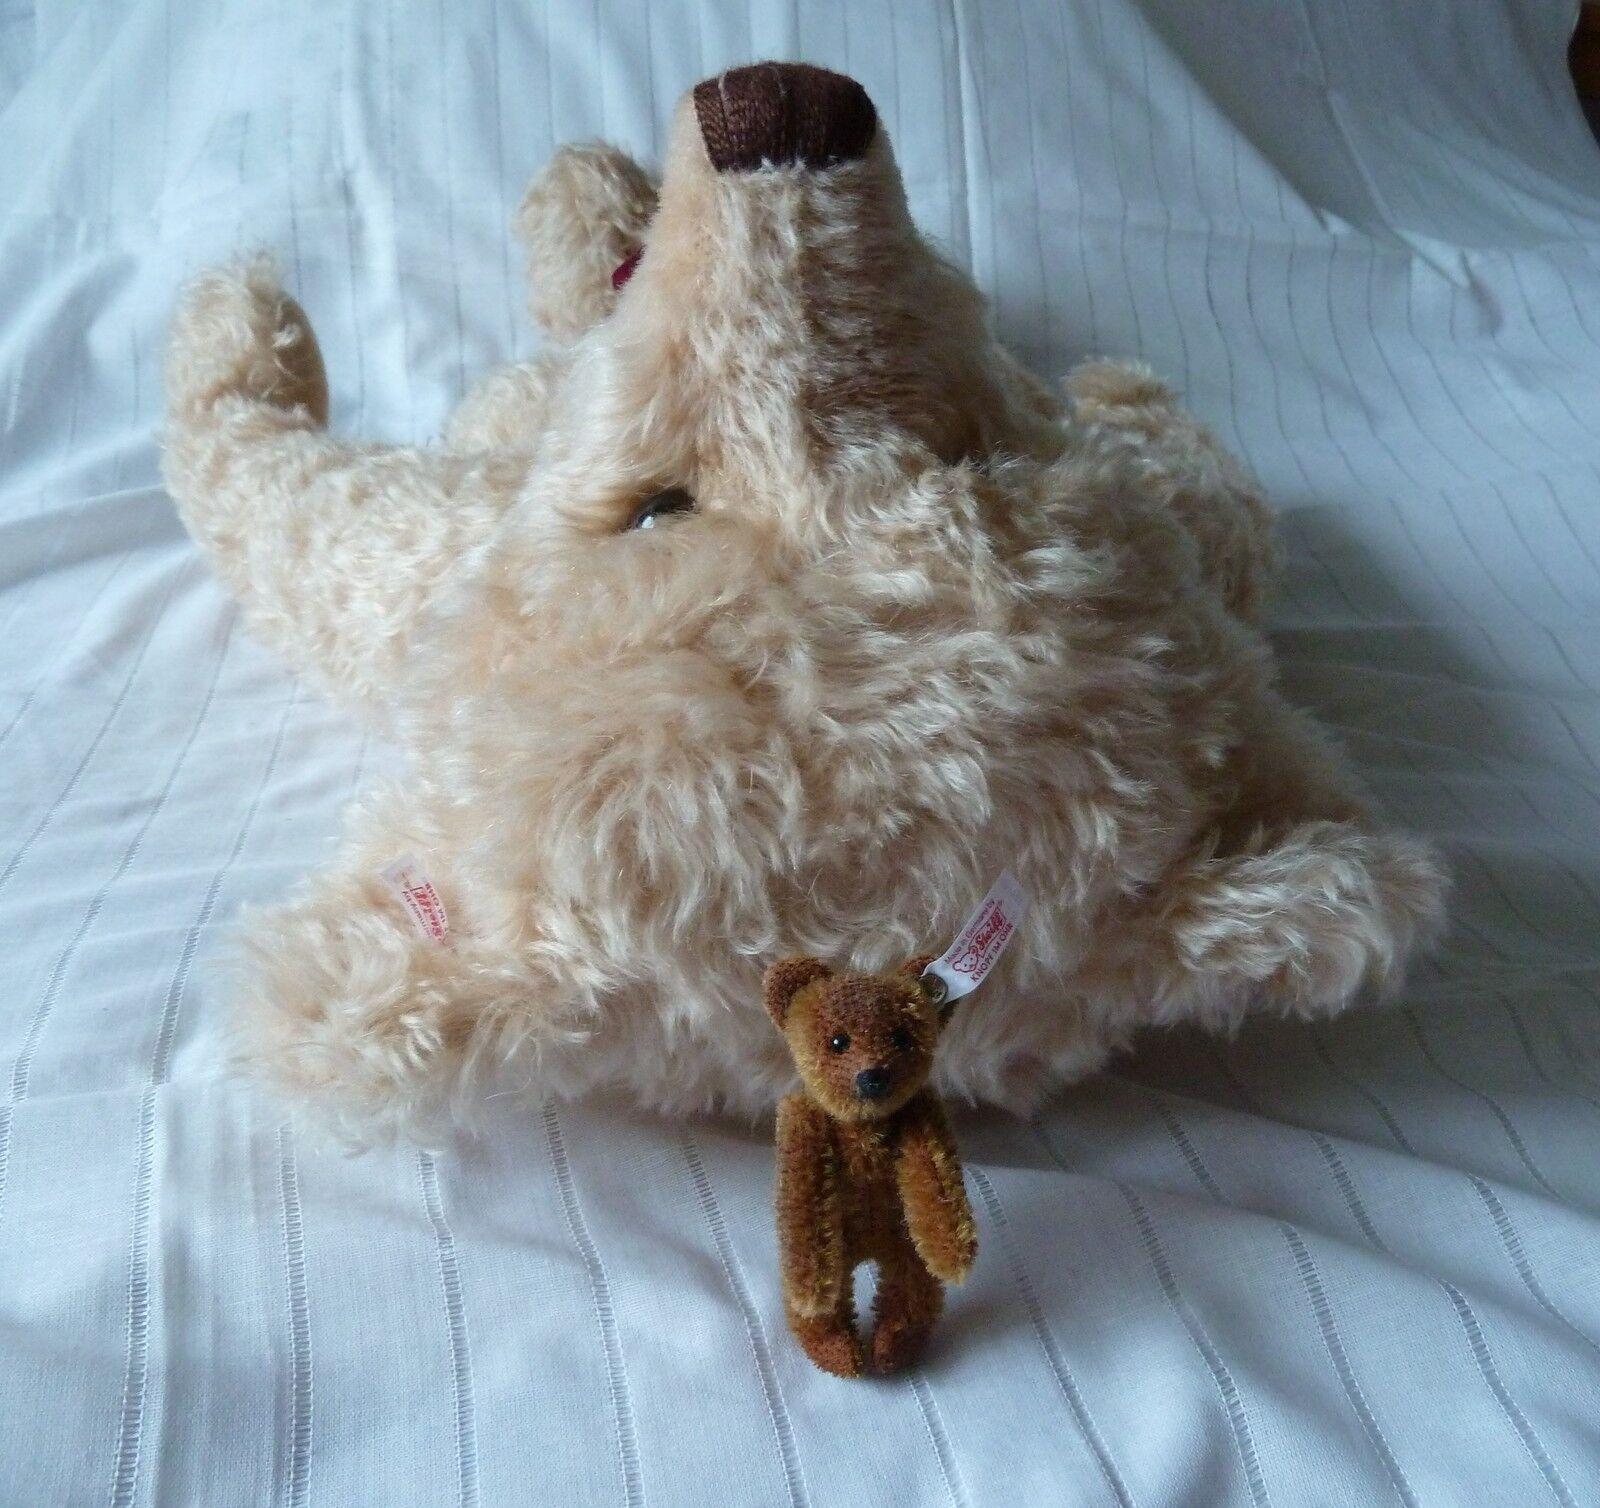 Steiff Teddy Teddy Teddy Ernst und Elsa 669682 66 cm + 9 cm Teddybär Bär XS 481 Nordamerika 6c167c